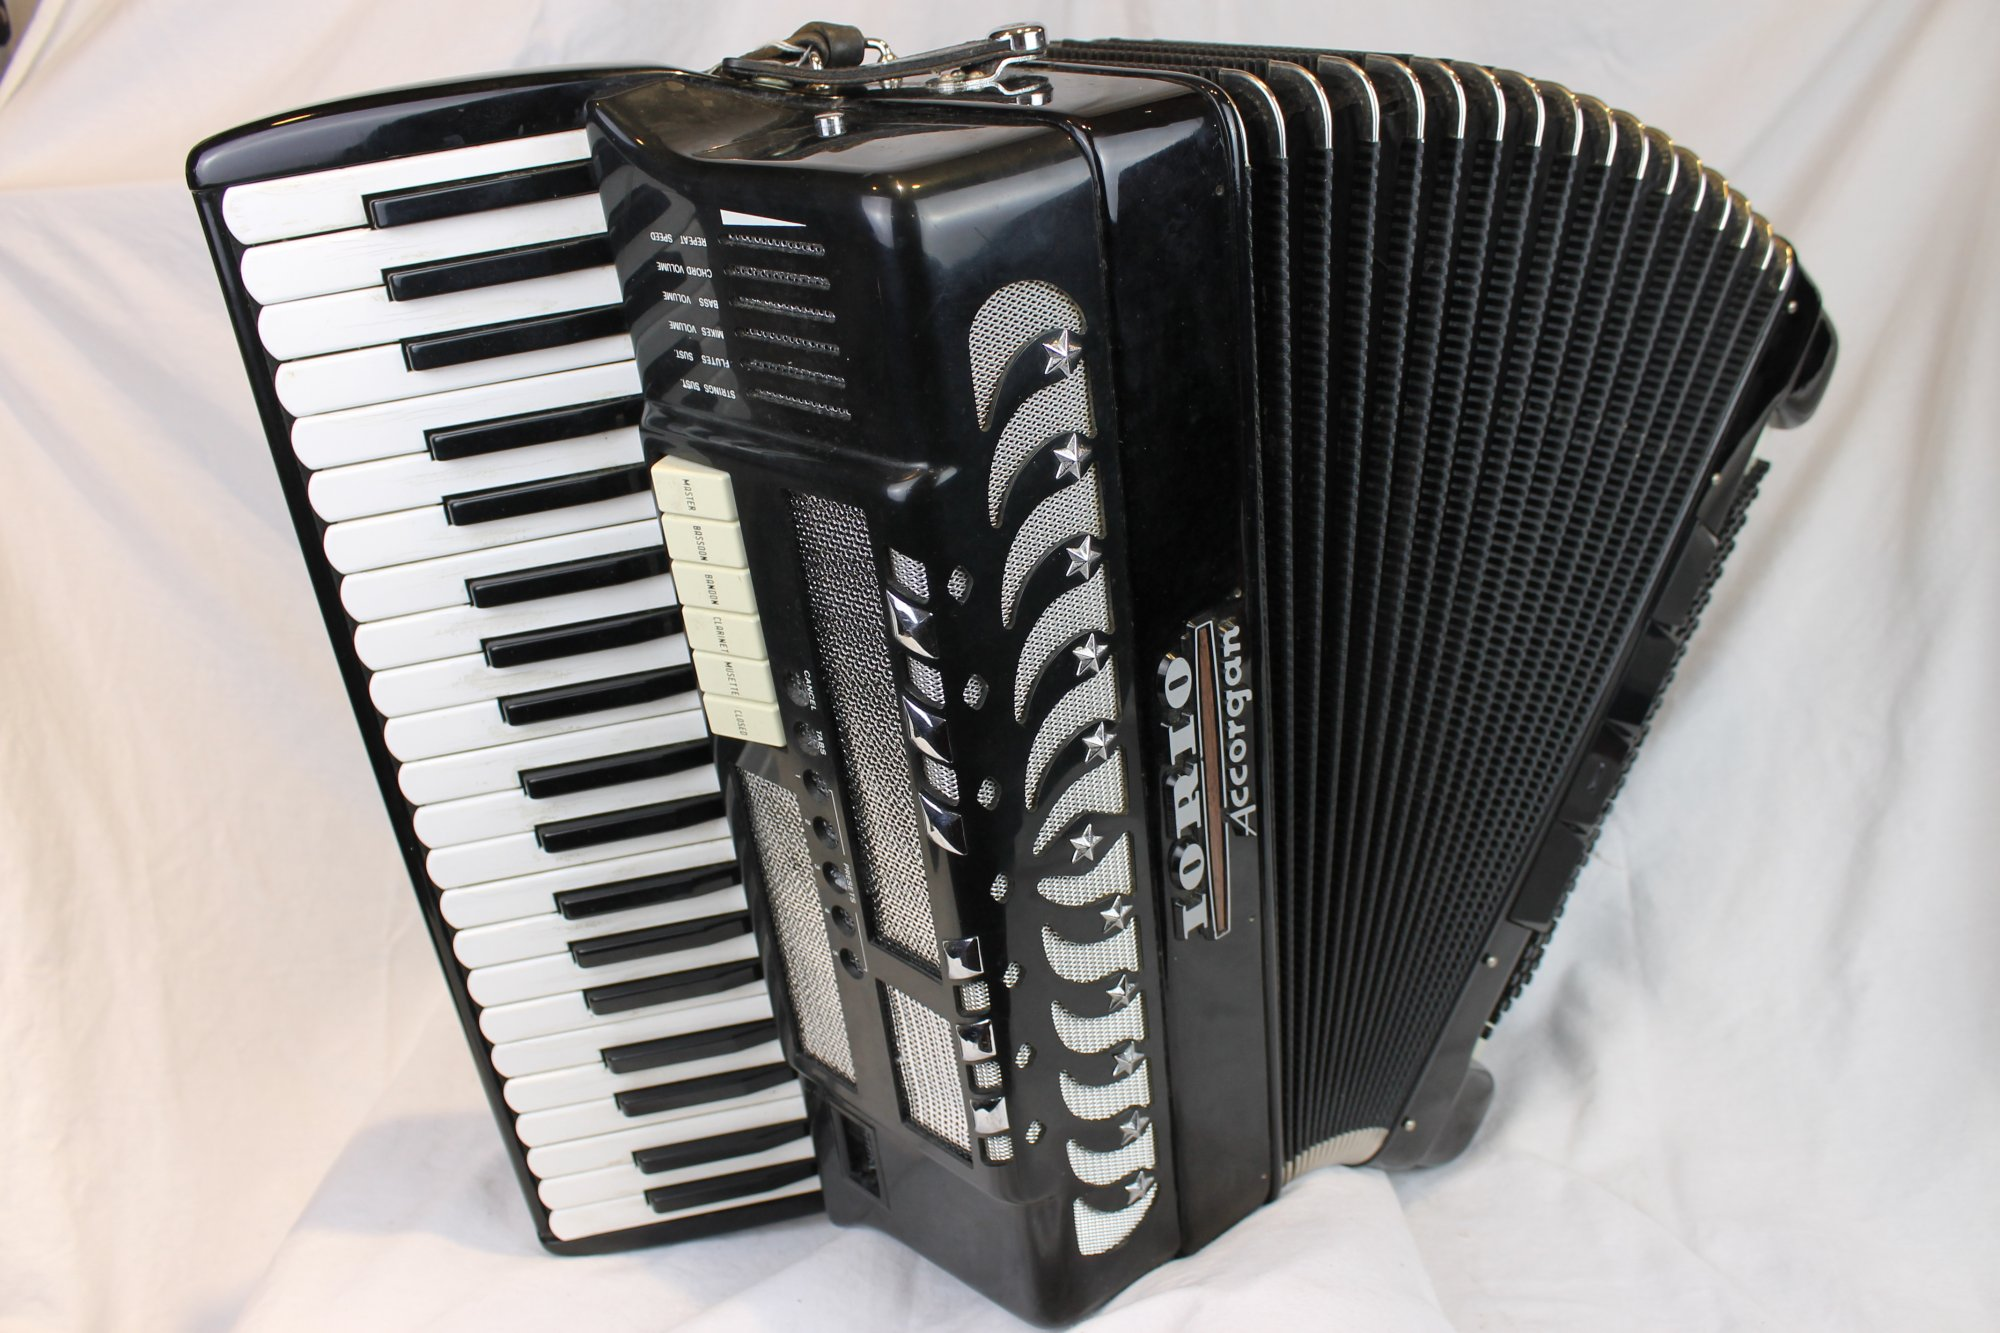 3806 - Black Iorio Accorgan Piano Accordion LMM 41 120